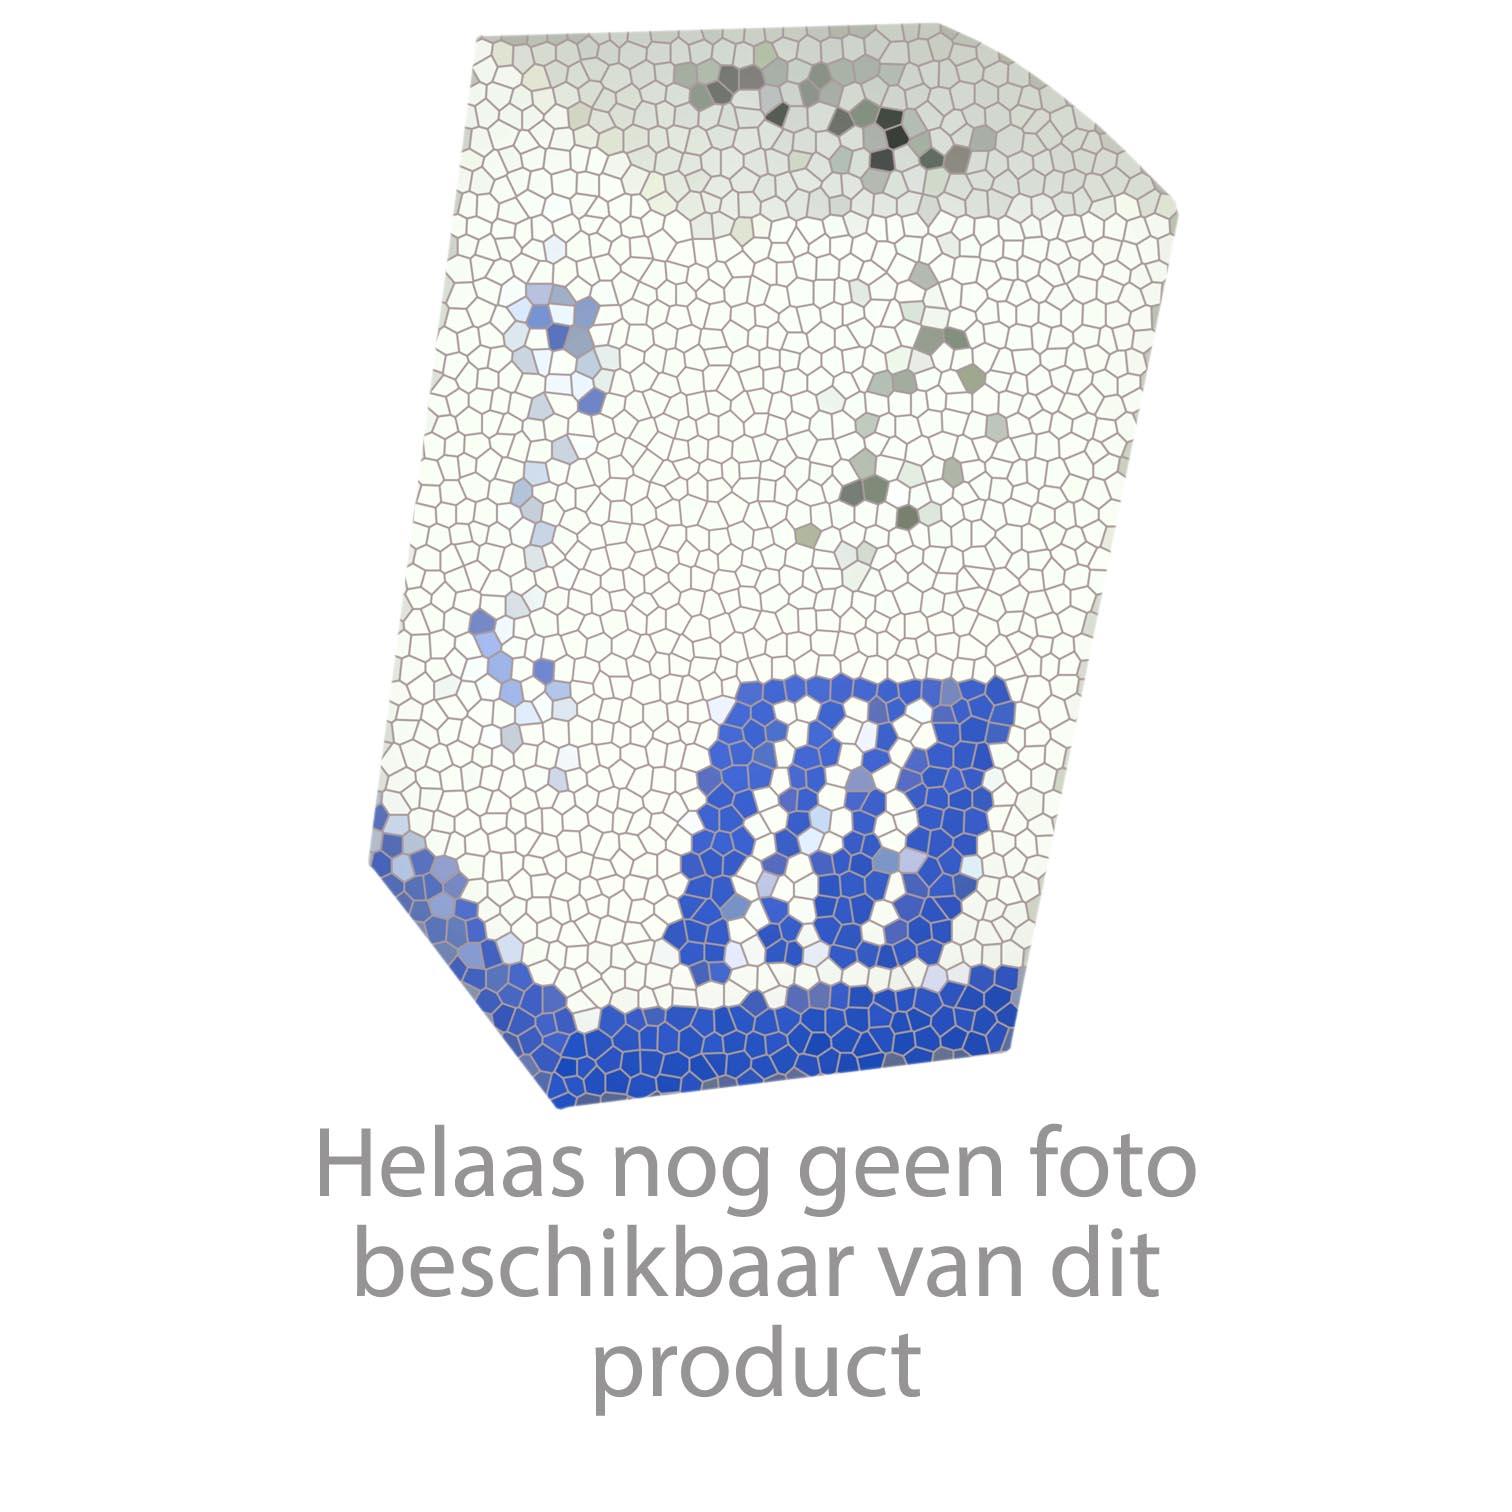 Grundfos drukverhogende circulatiepomp UPA Home booster